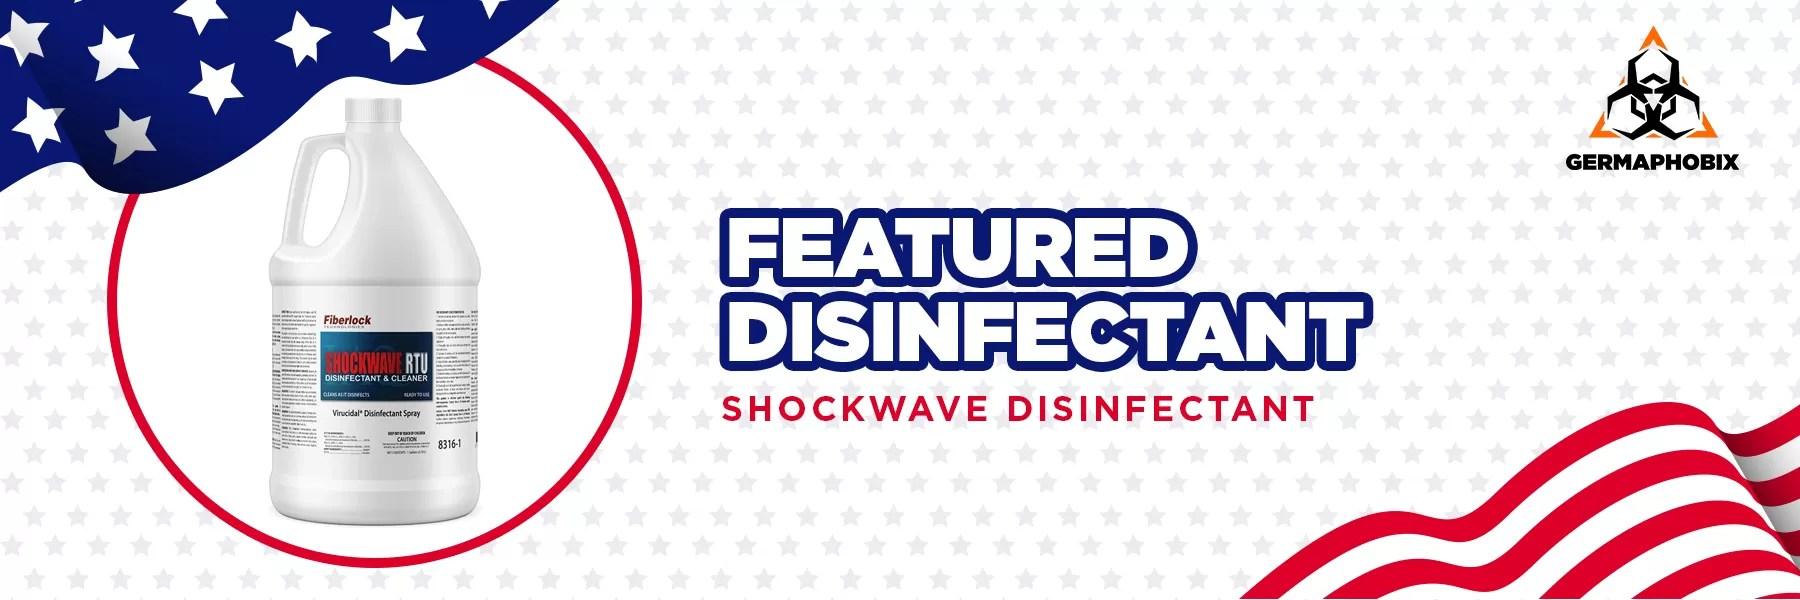 Fiberlock Shockwave RTU Disinfectant